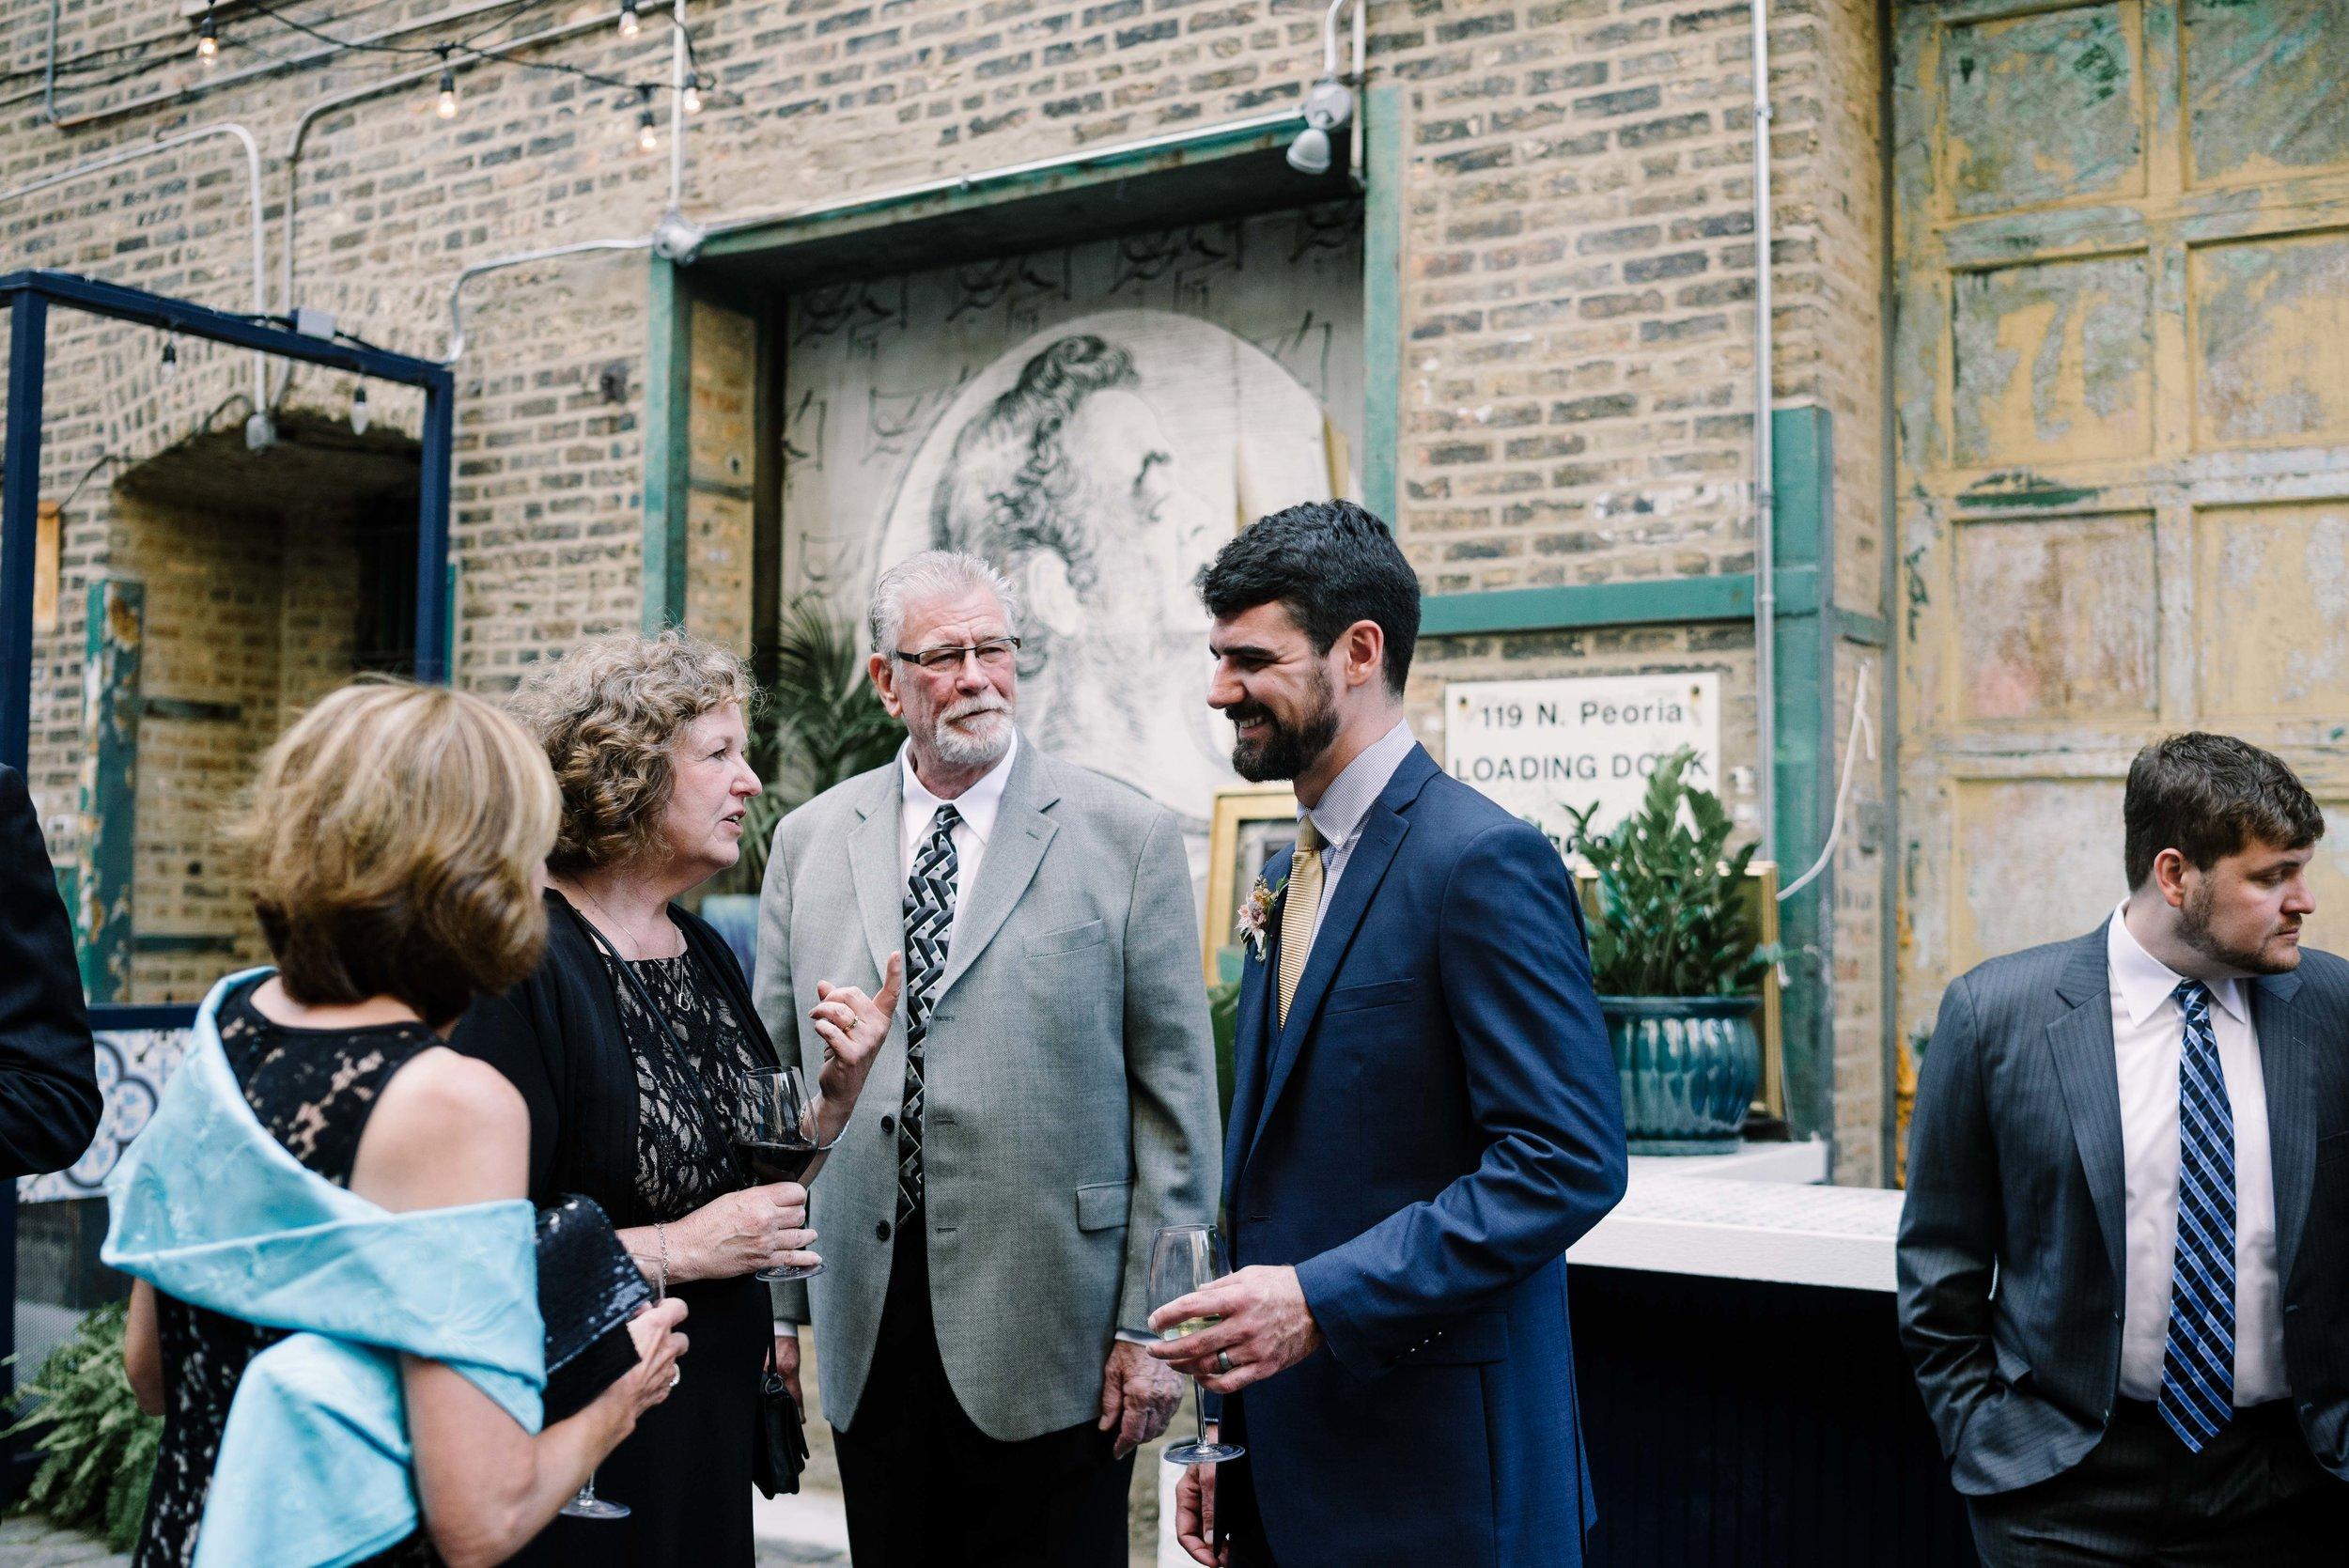 Patricia-Steve-Blog-Indianapolis-Wedding-75.jpg